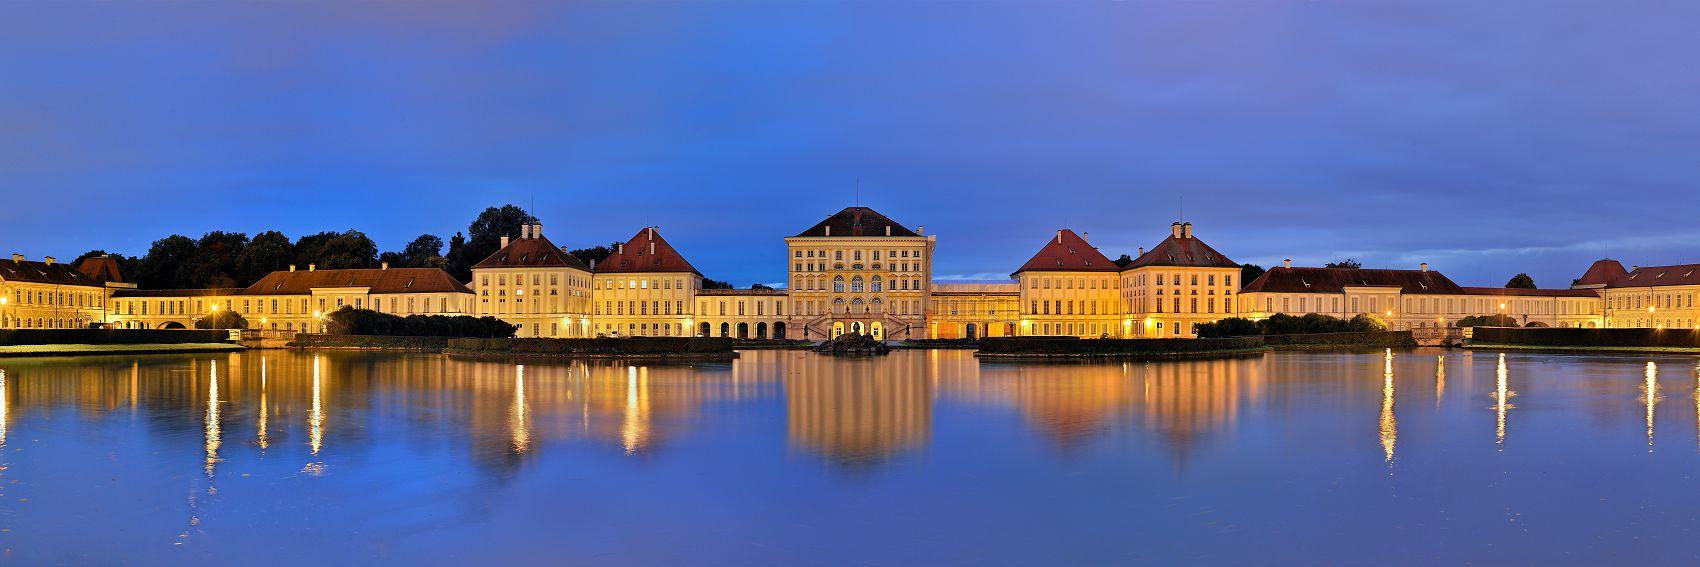 Замок в Мюнхене